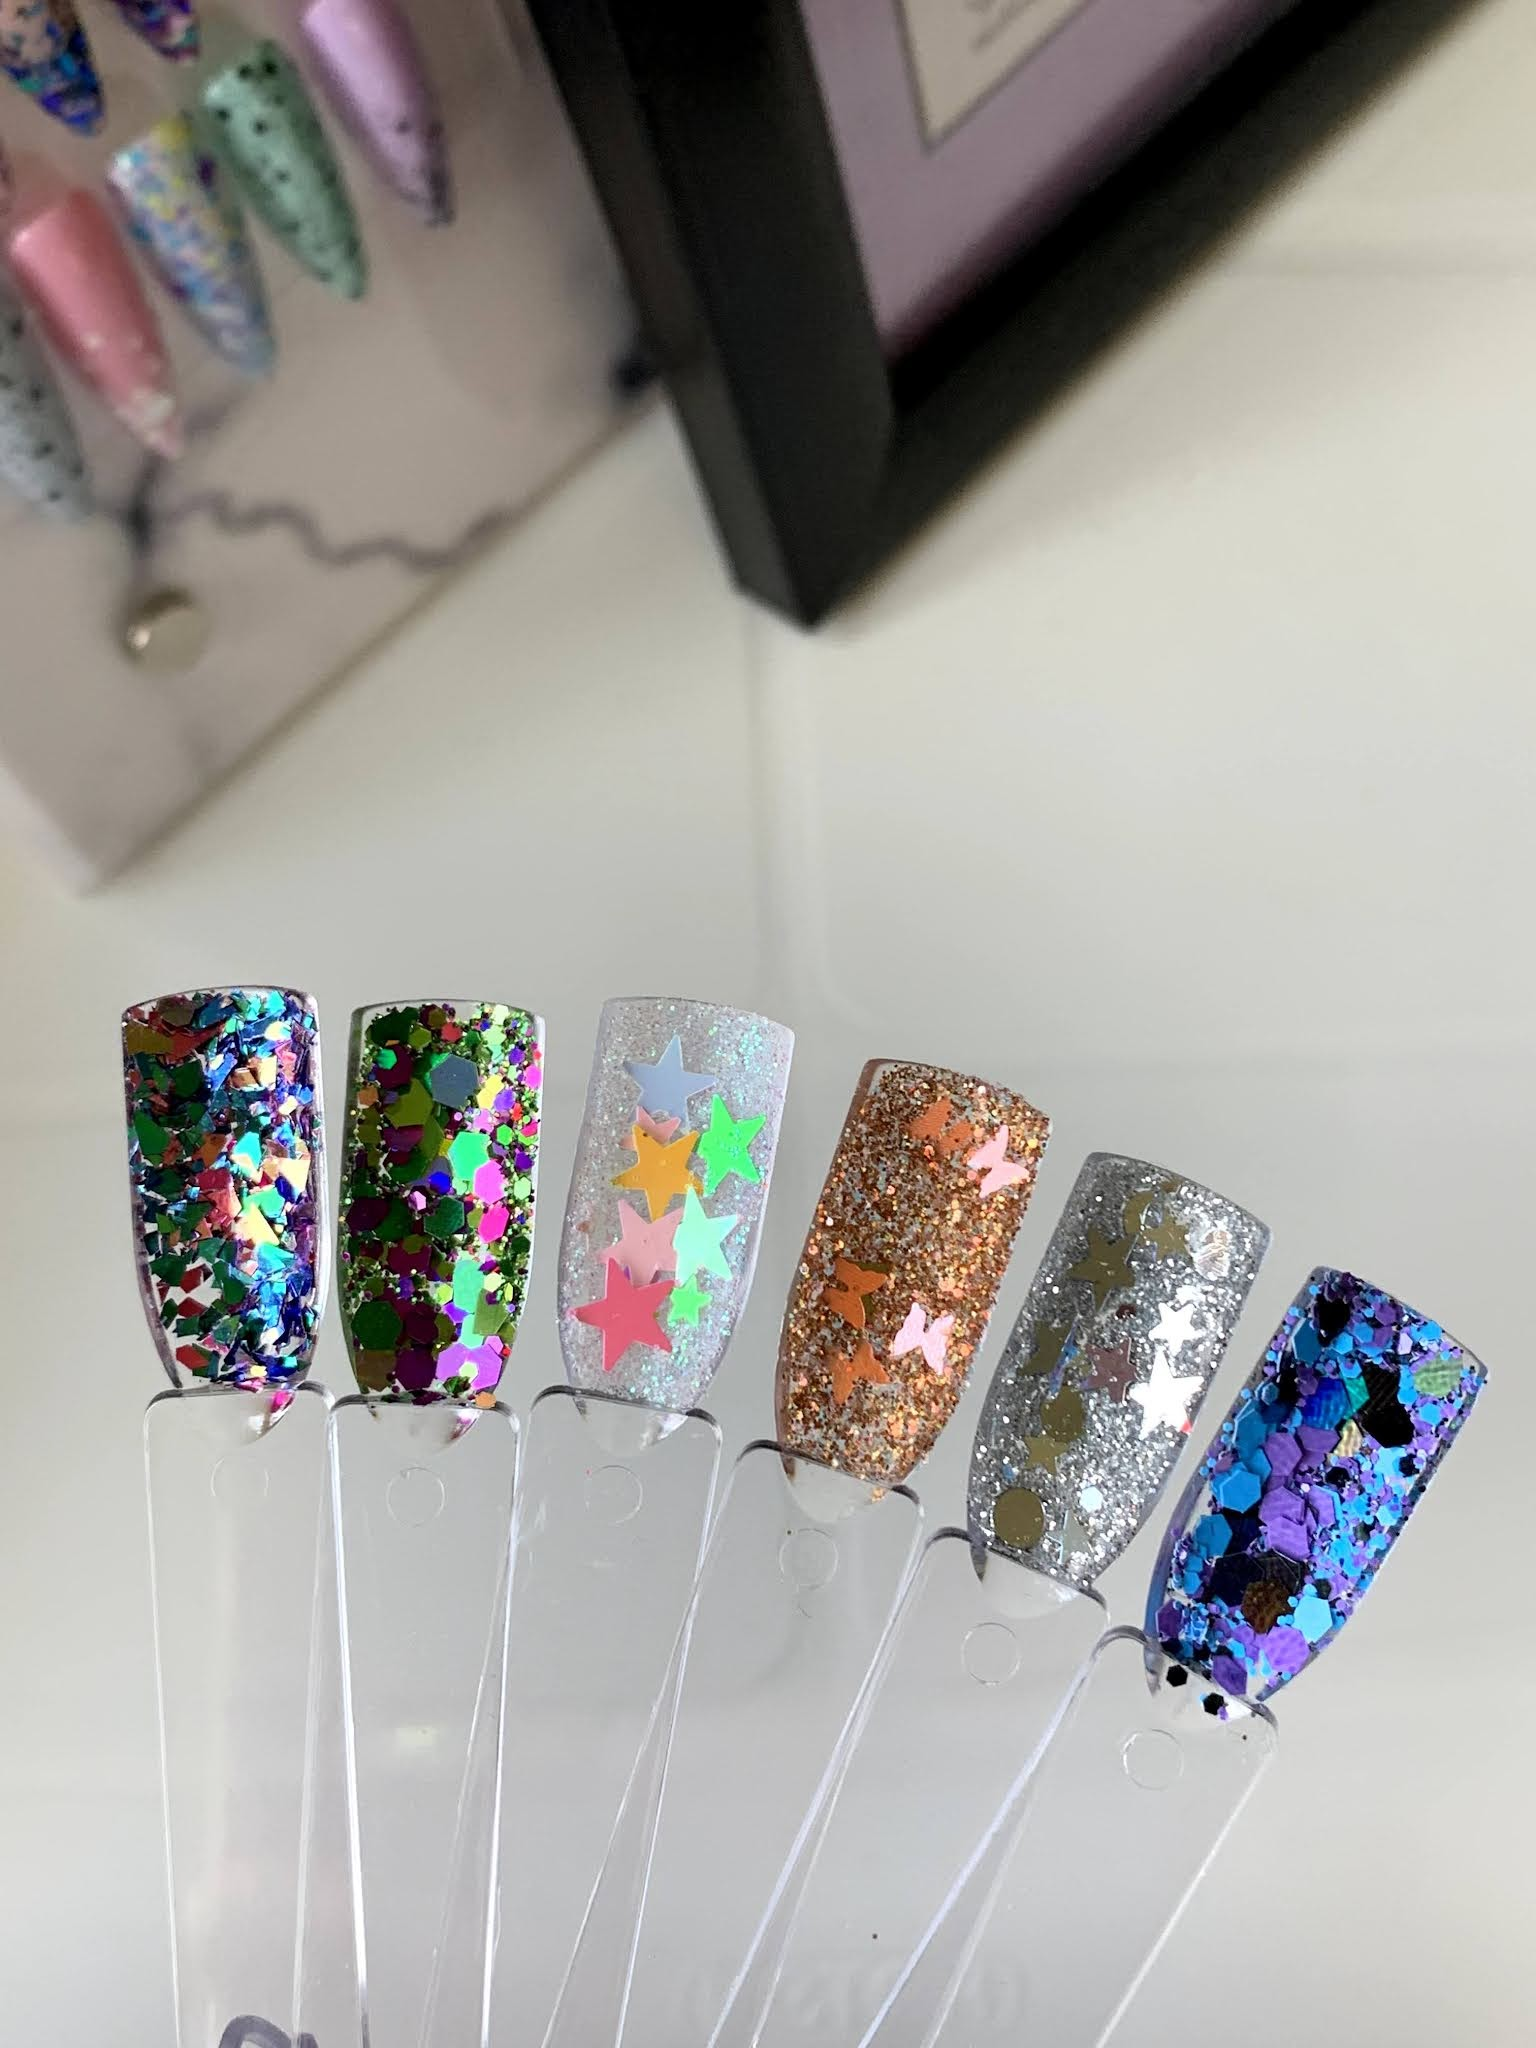 SSUK Glitter swatches of their April VIP box